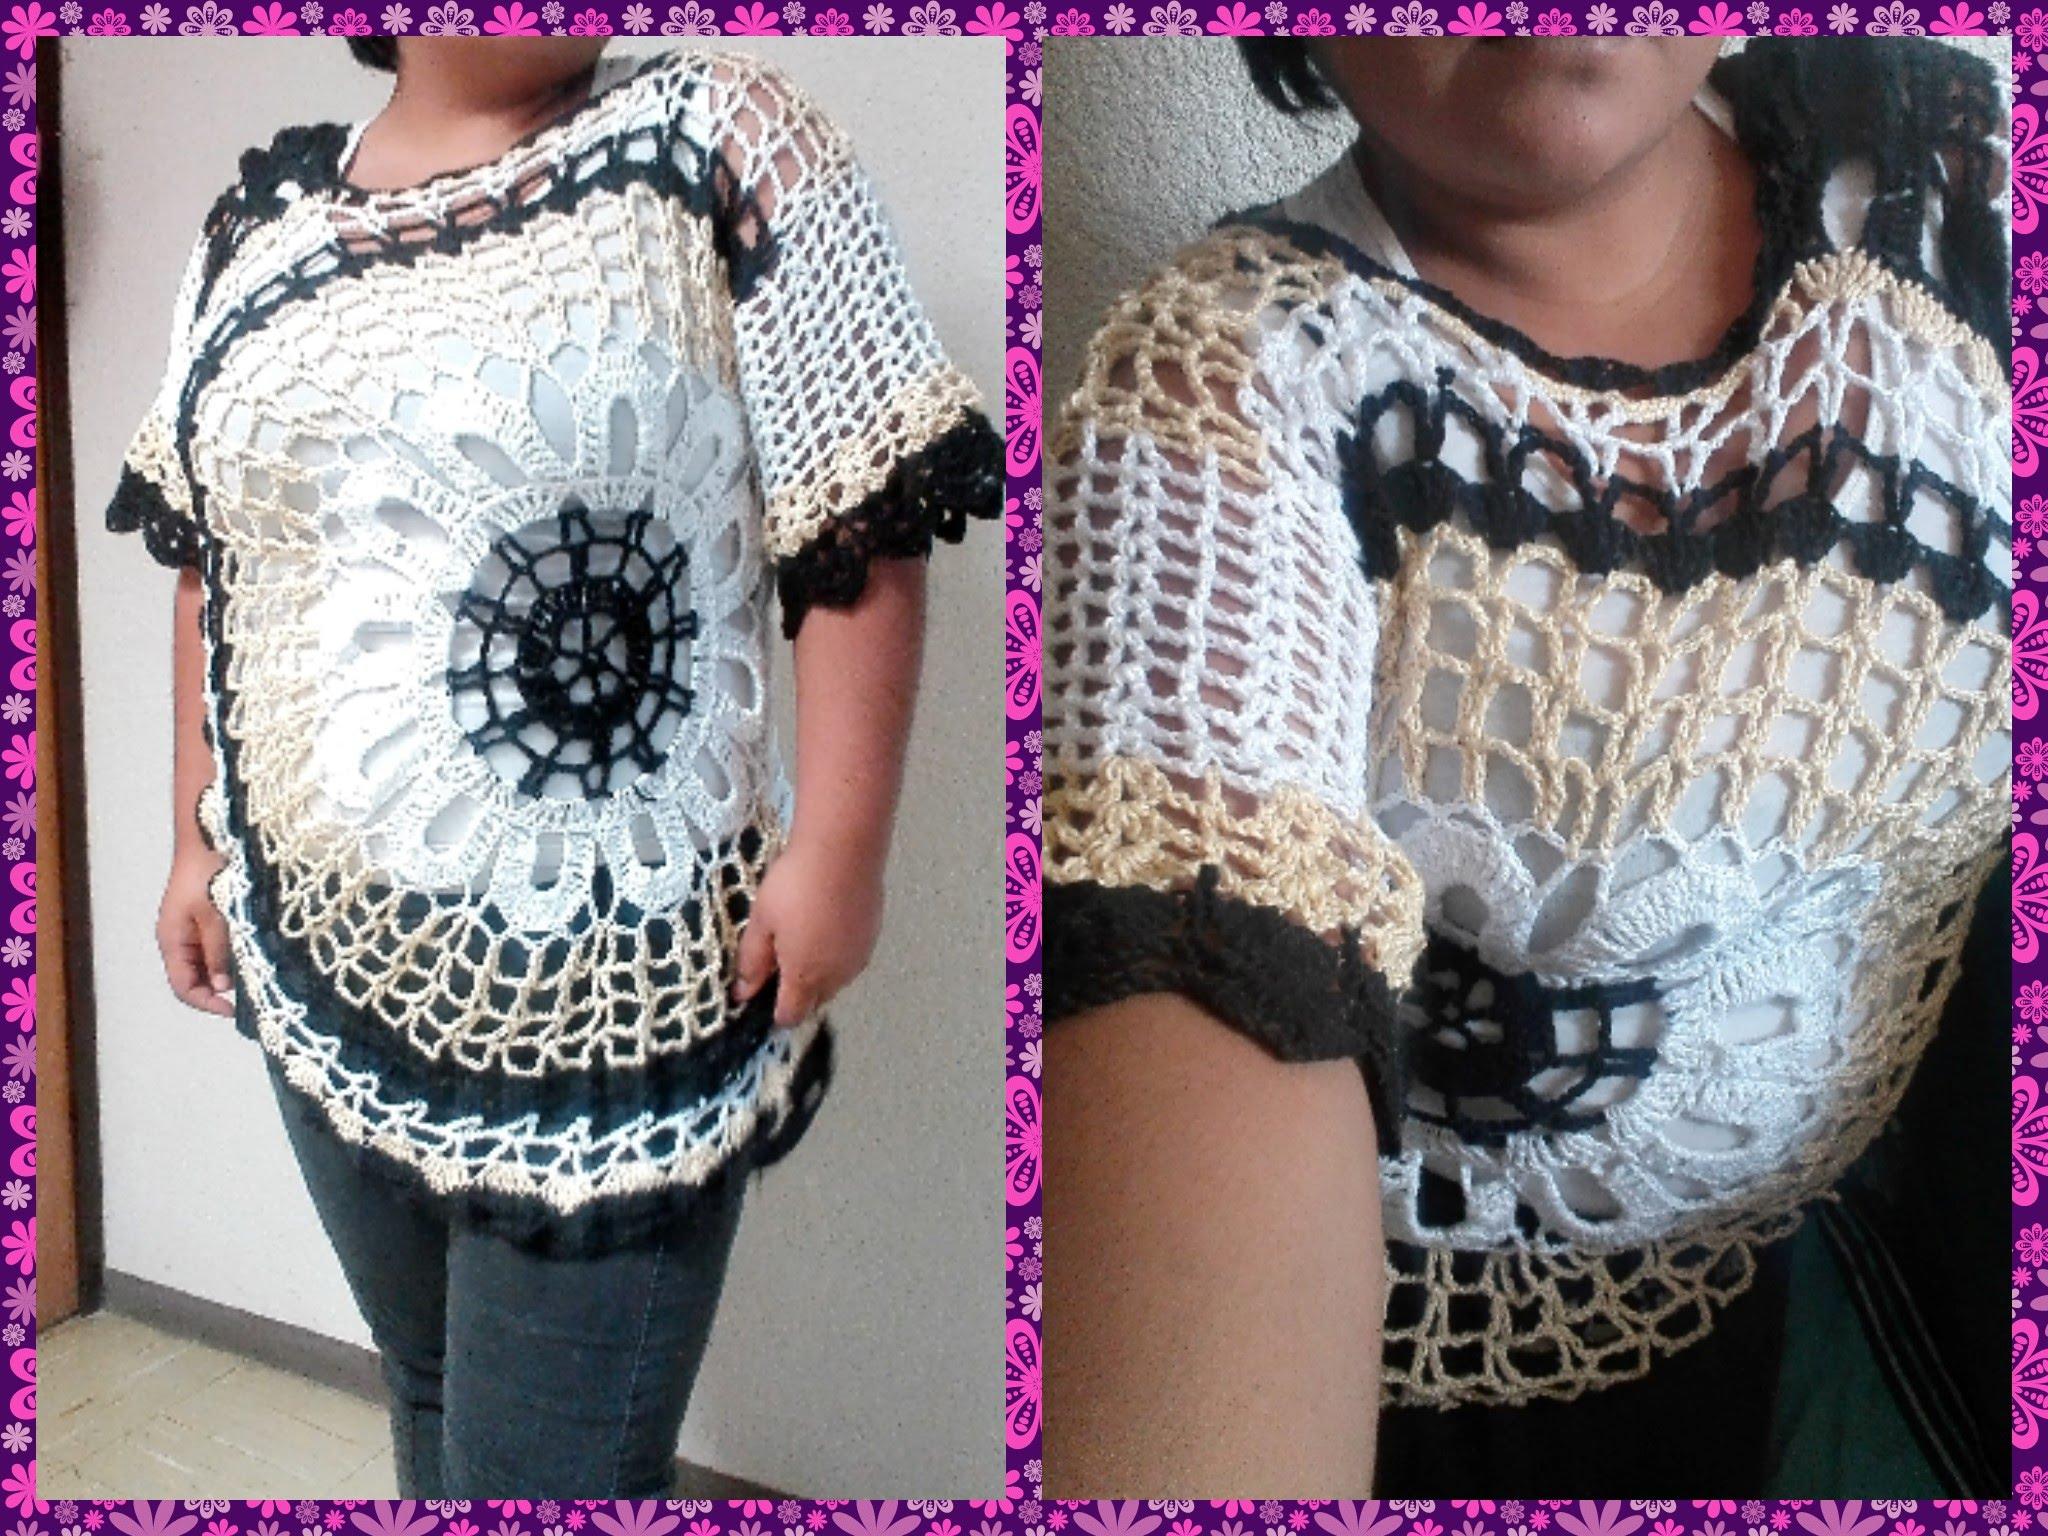 bluson circulo crochet-manga larga-patron-tutorial-esquema-otakulandia.es (9)